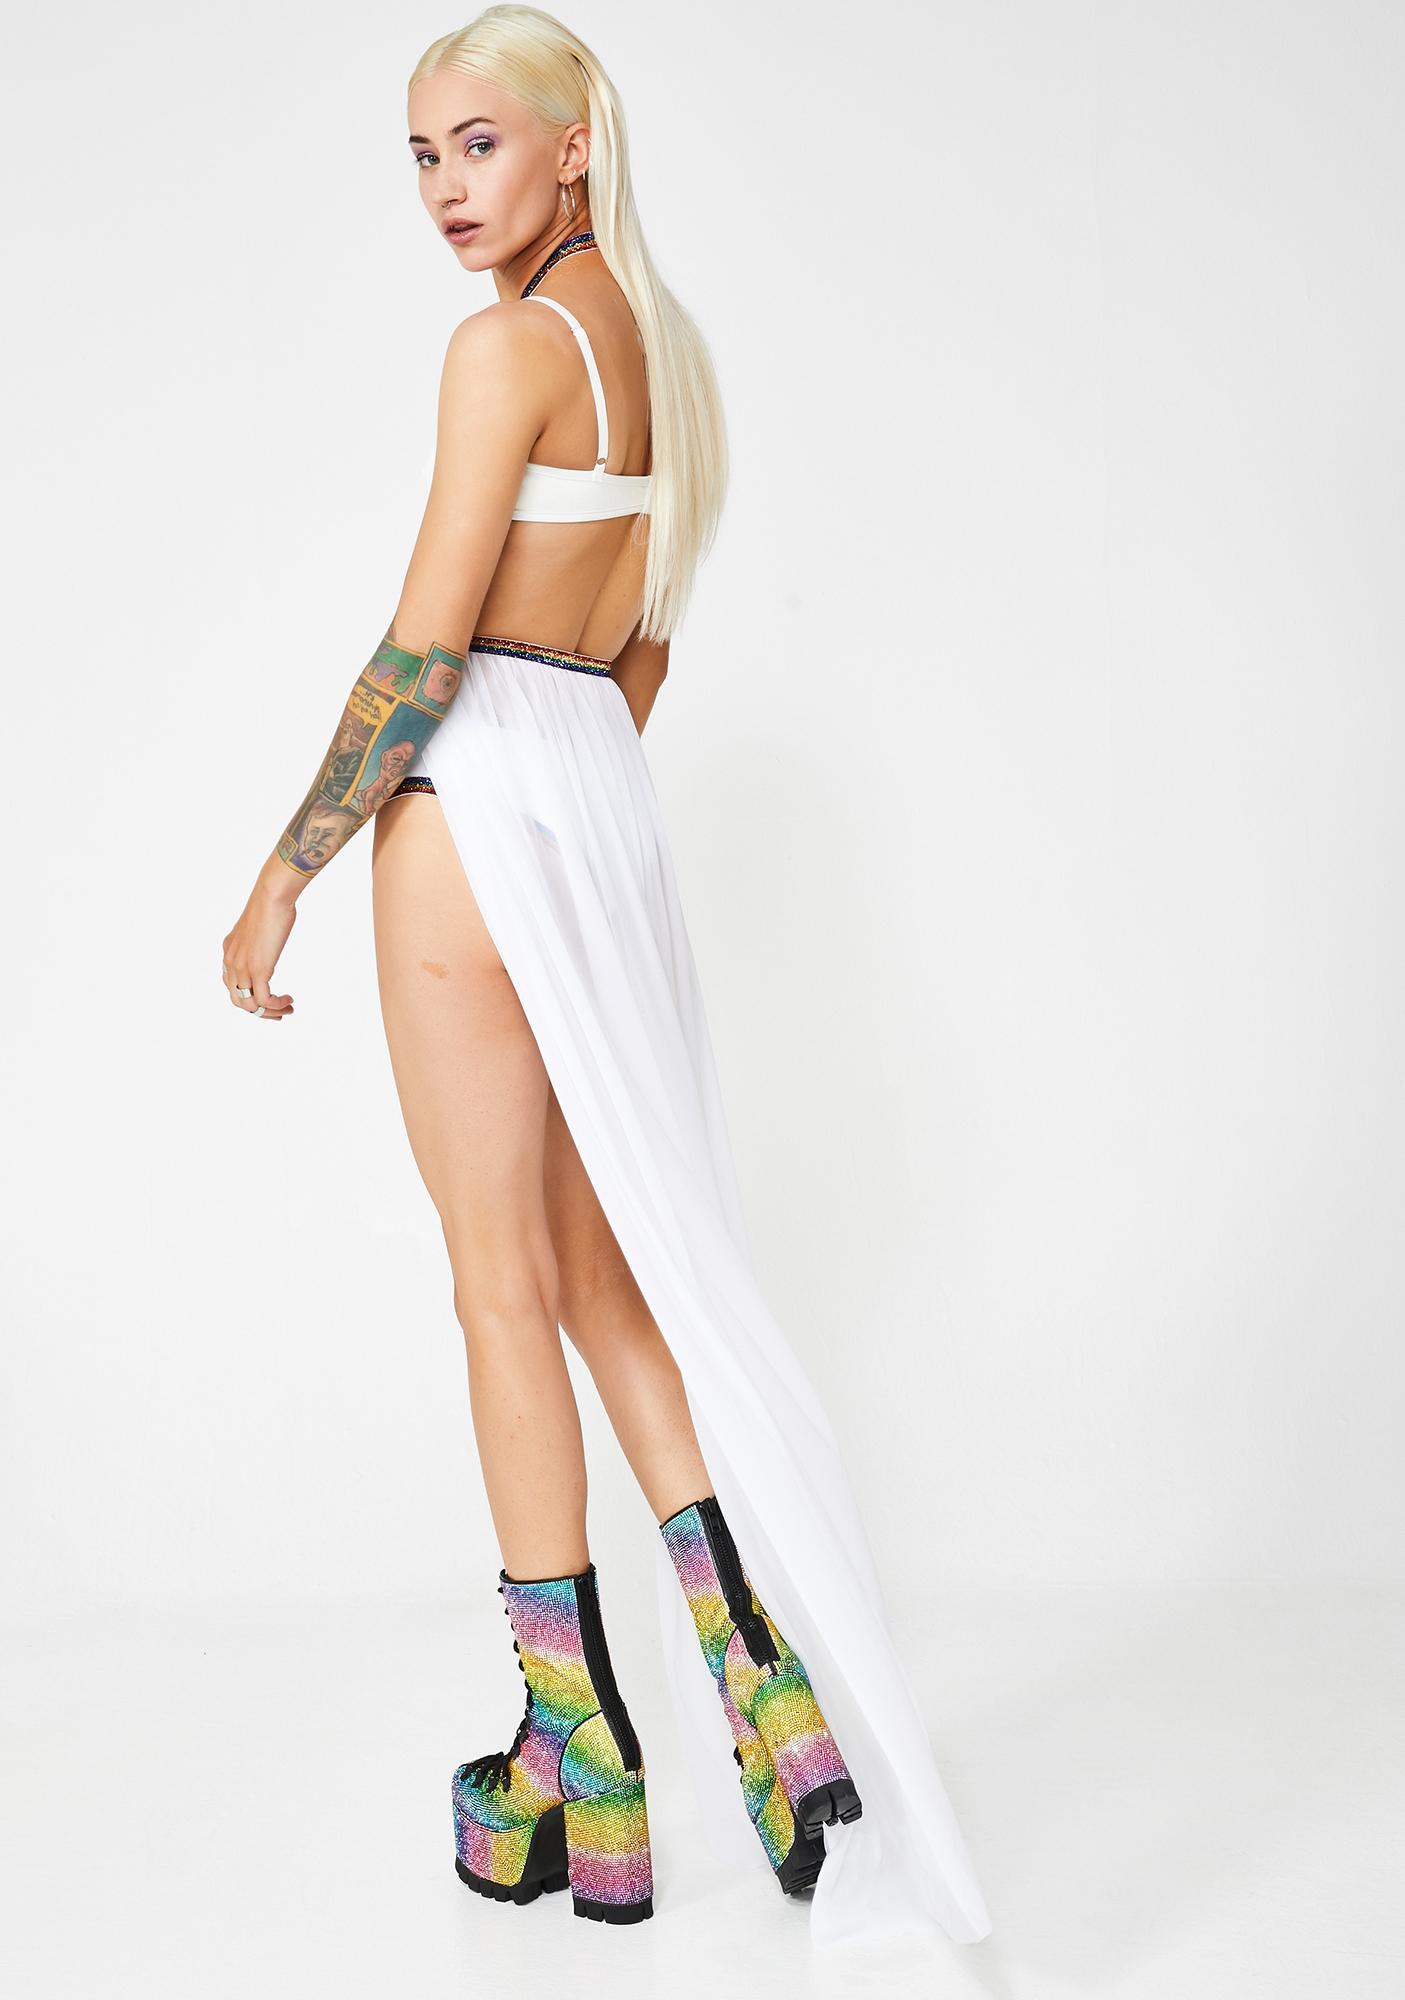 J Valentine Freaky Spellbound Harness Skirt